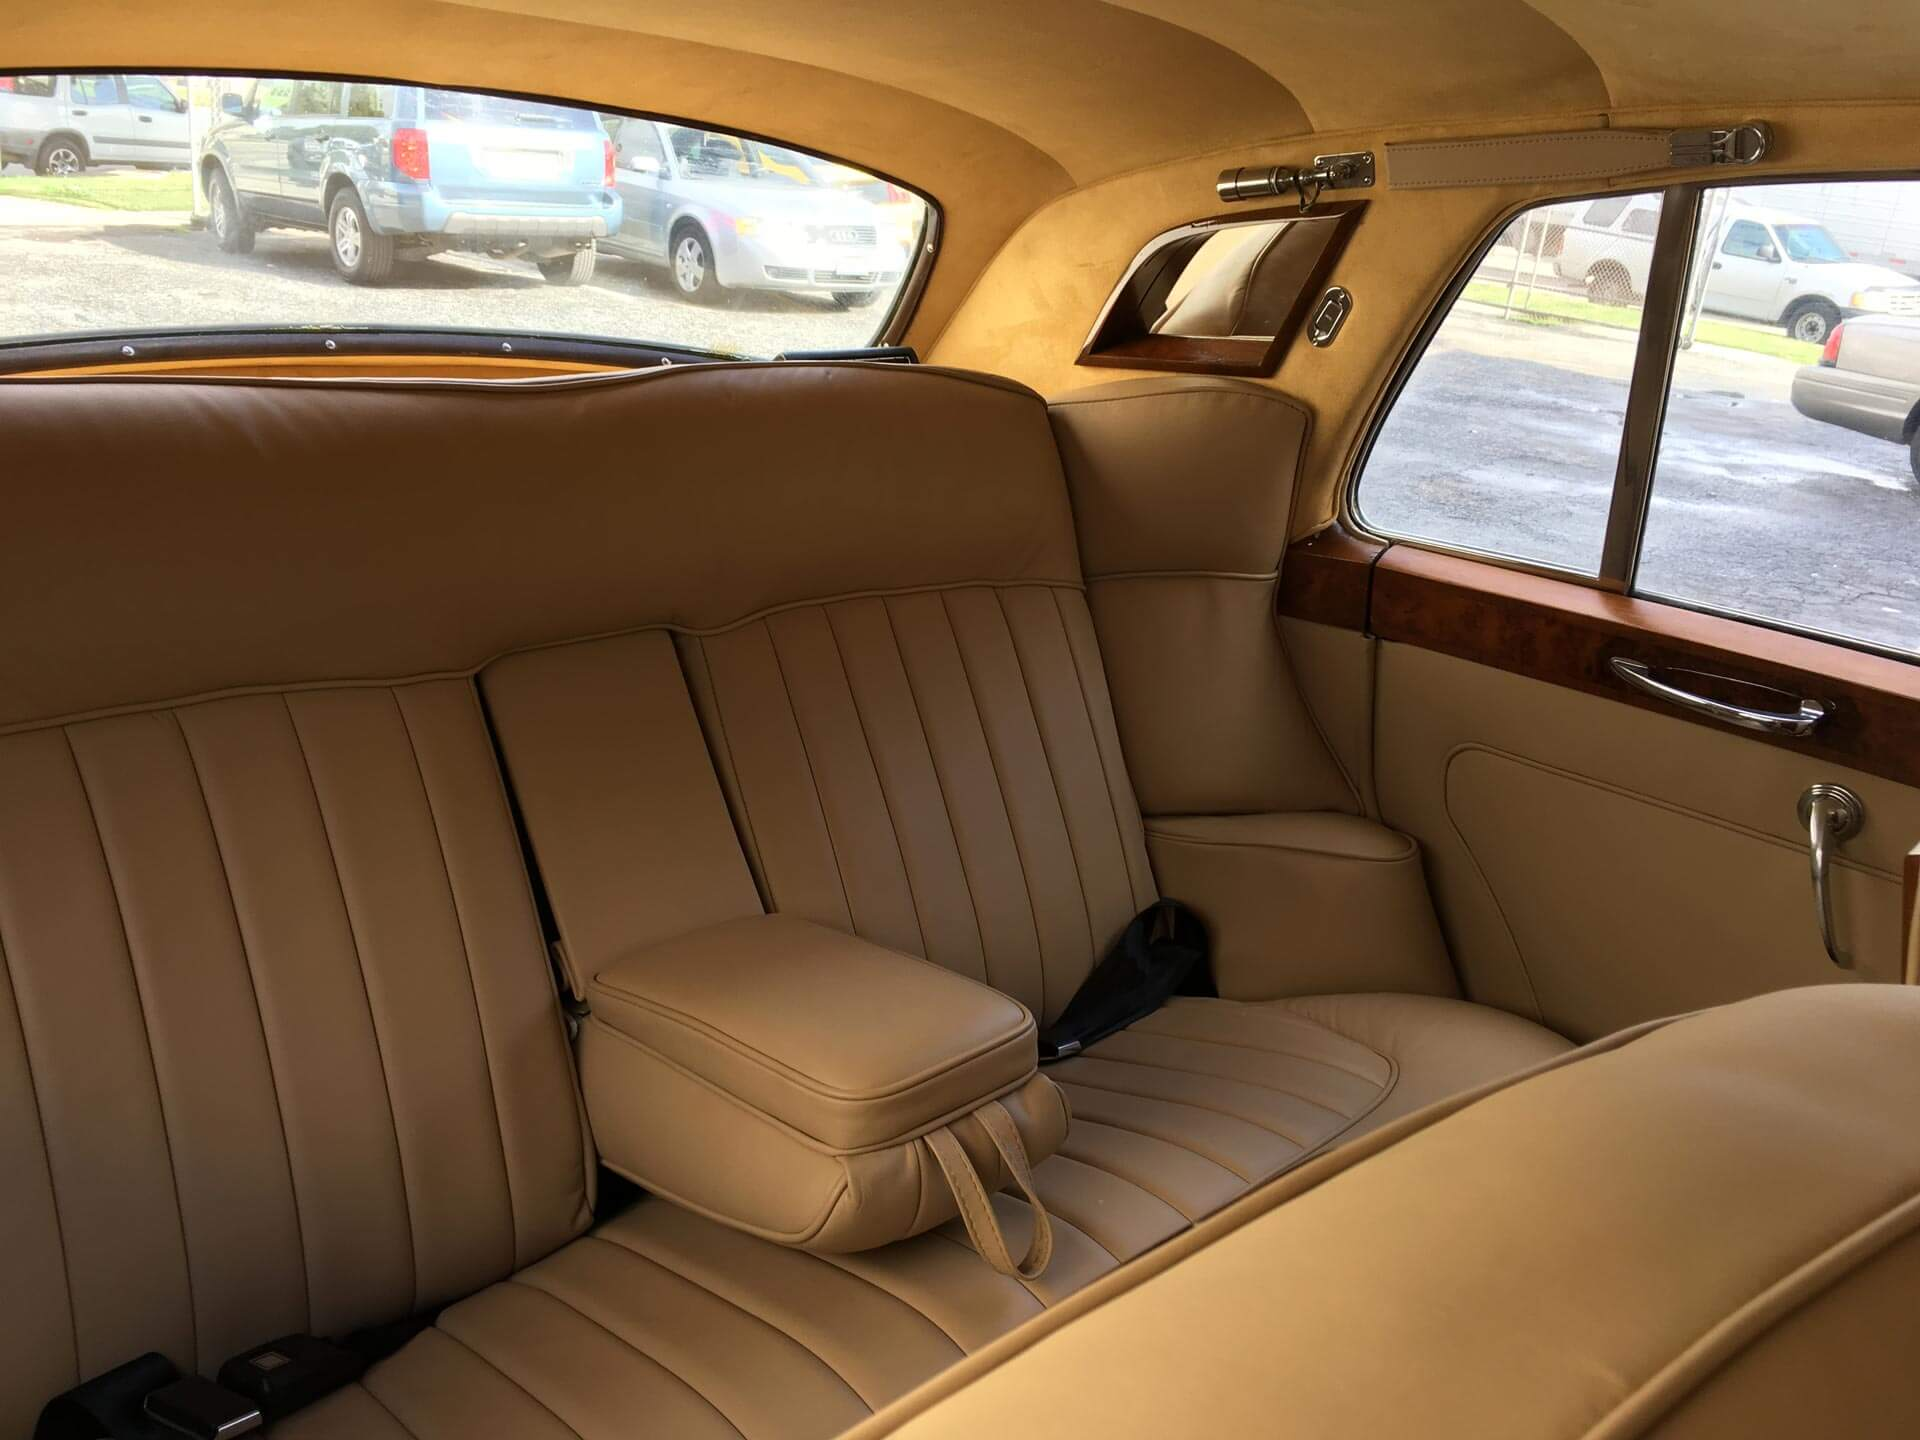 Car interior restoration in Los Angeles | Best Way